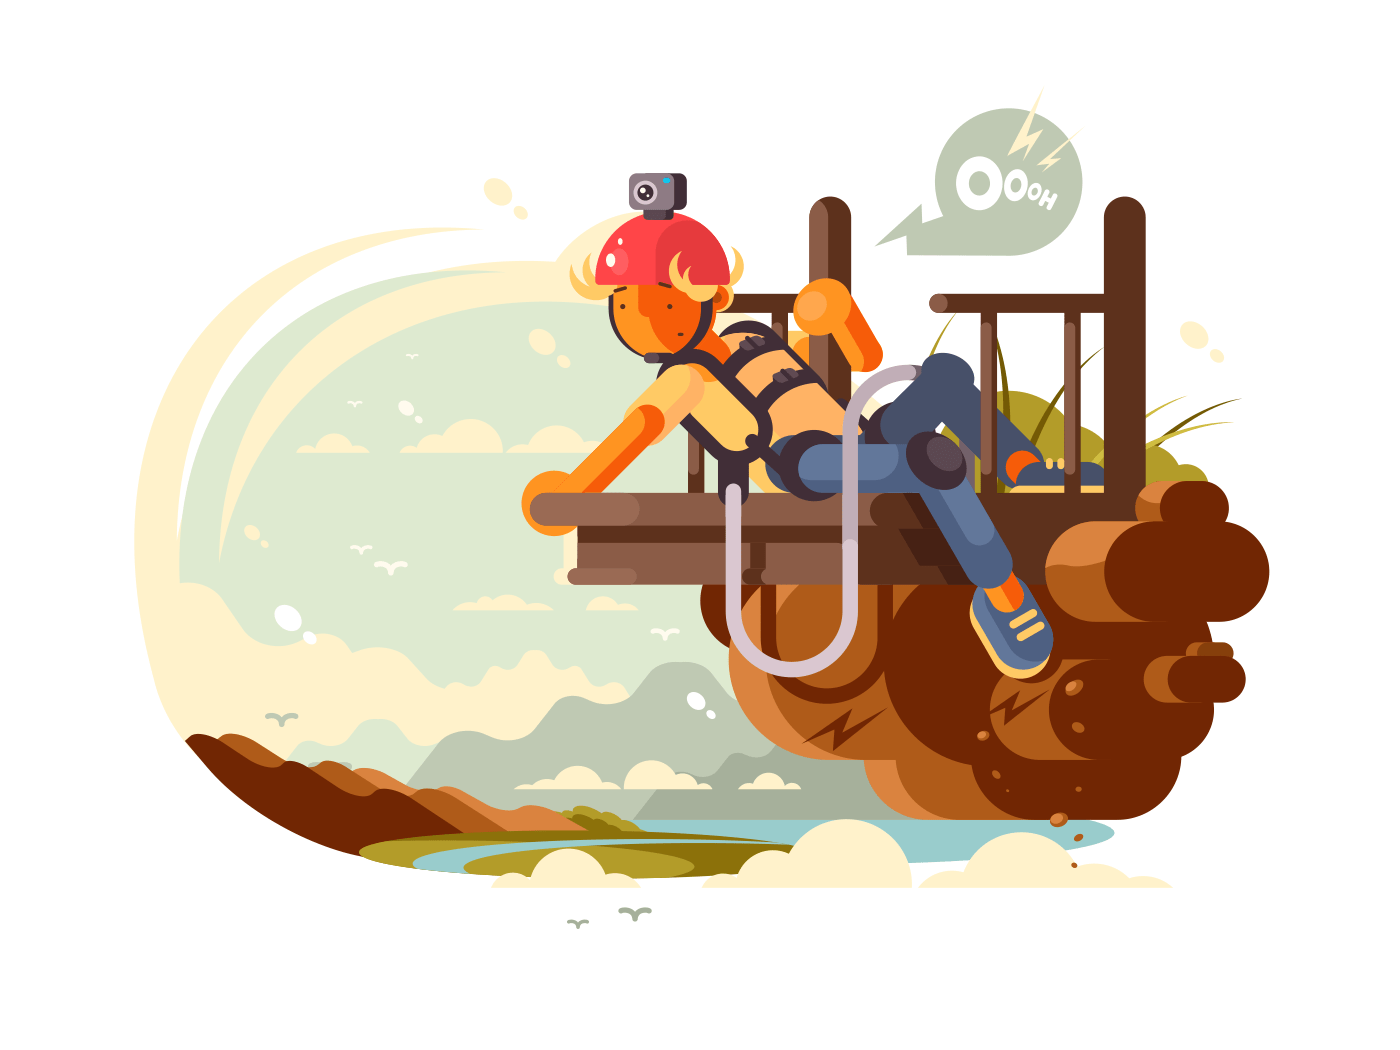 Man bungee jumping illustration